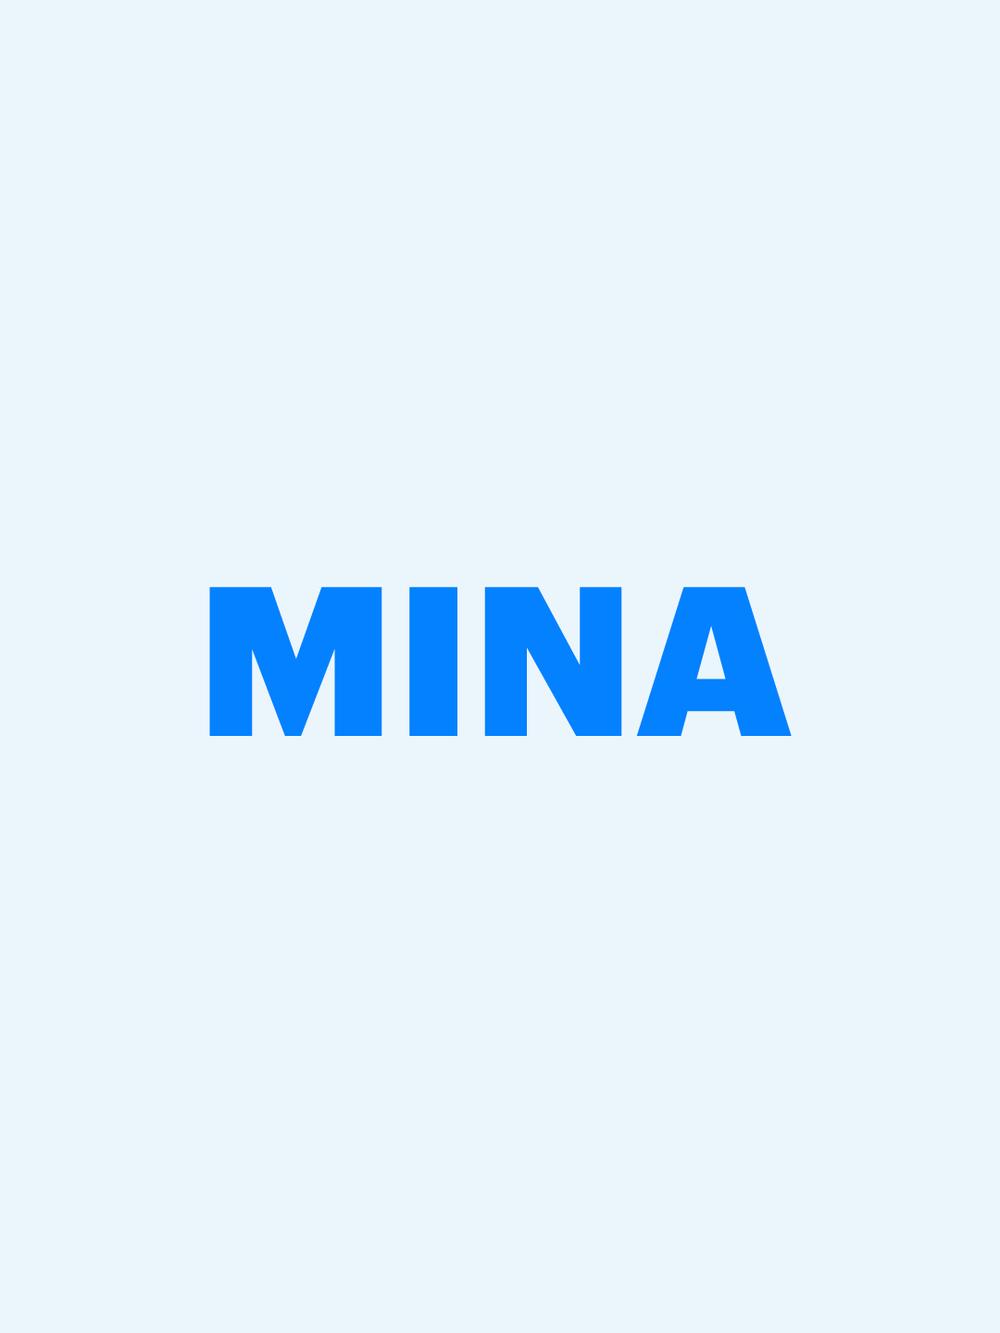 Mina_BlueBG_VER.png